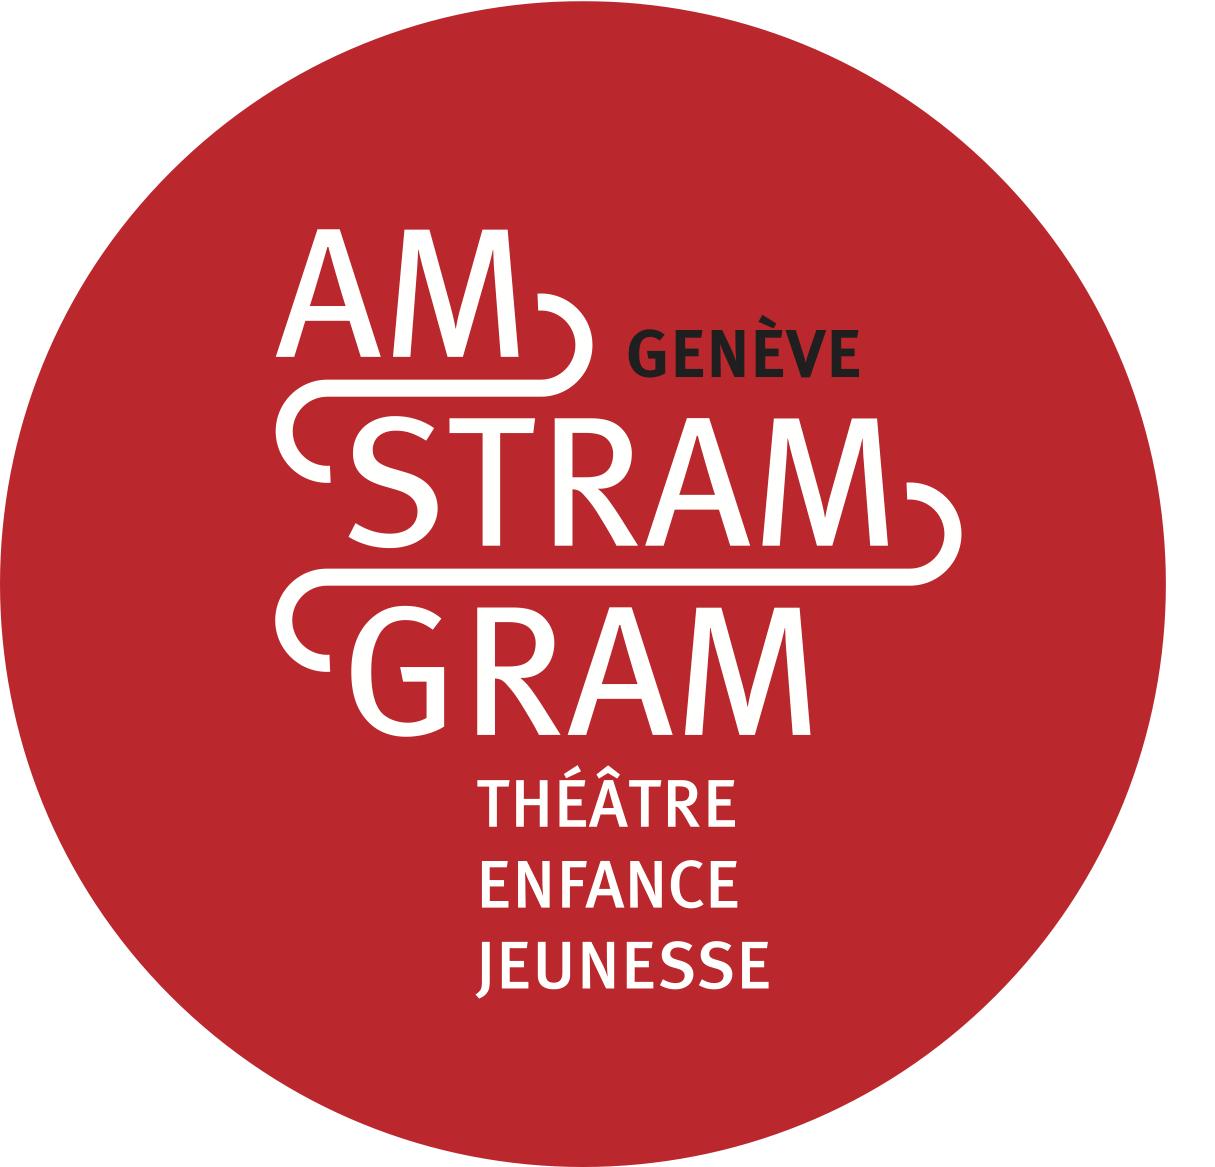 Théâtre Am Stram Gram - Genève